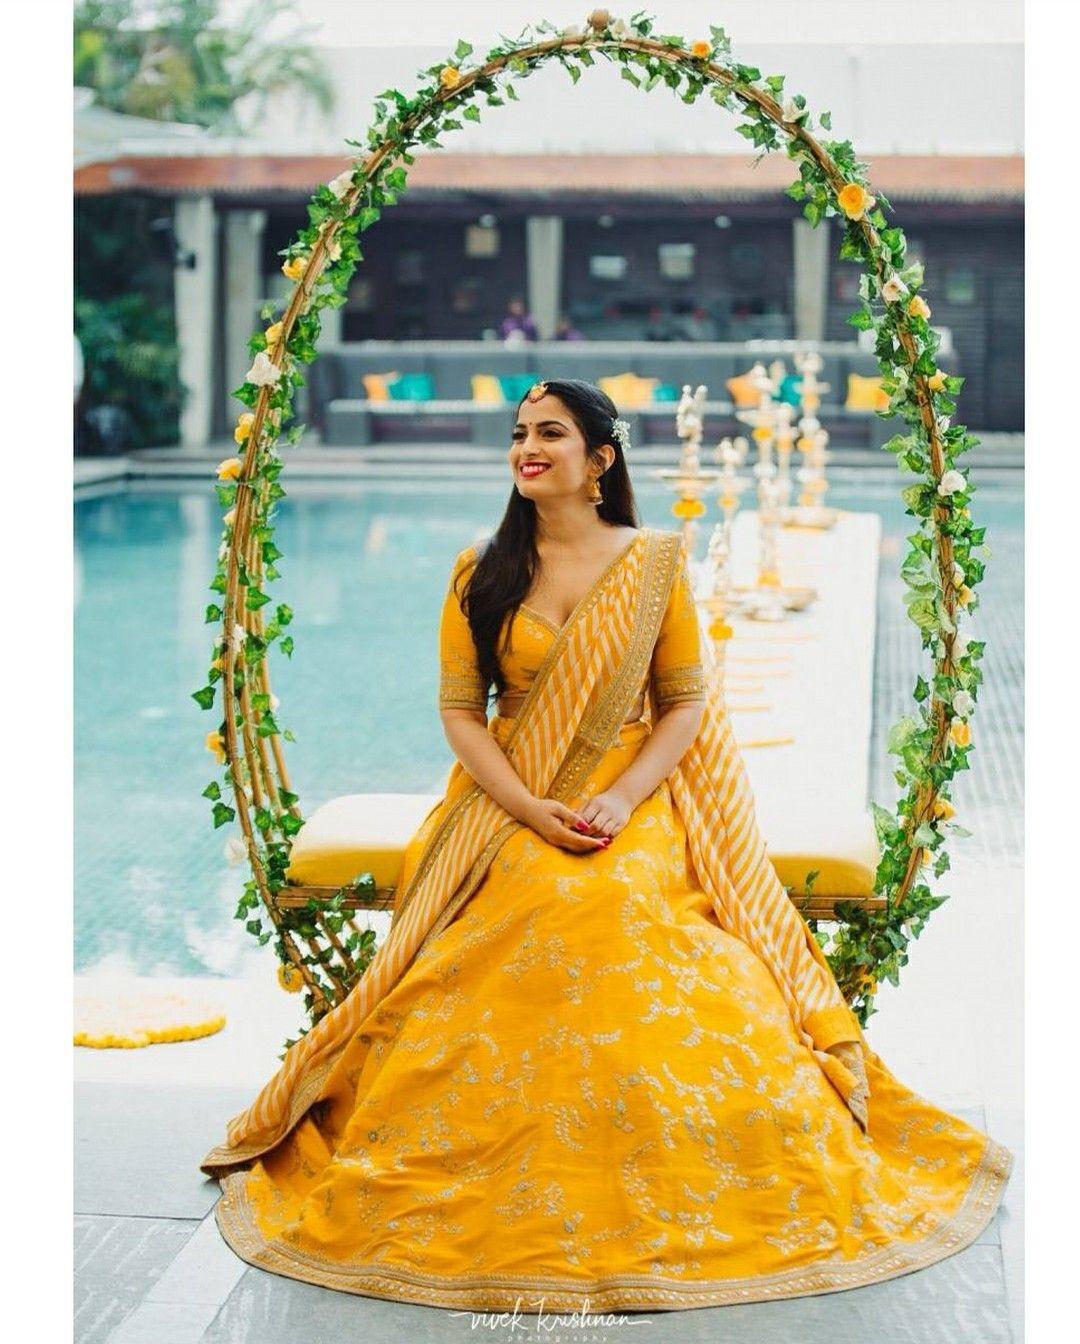 342a4c47b0 Haldi ceremony outfit Outfit courtesy: Sabyasachi Mukherjee Picture  credits: Vivek Krishnan via Instagram